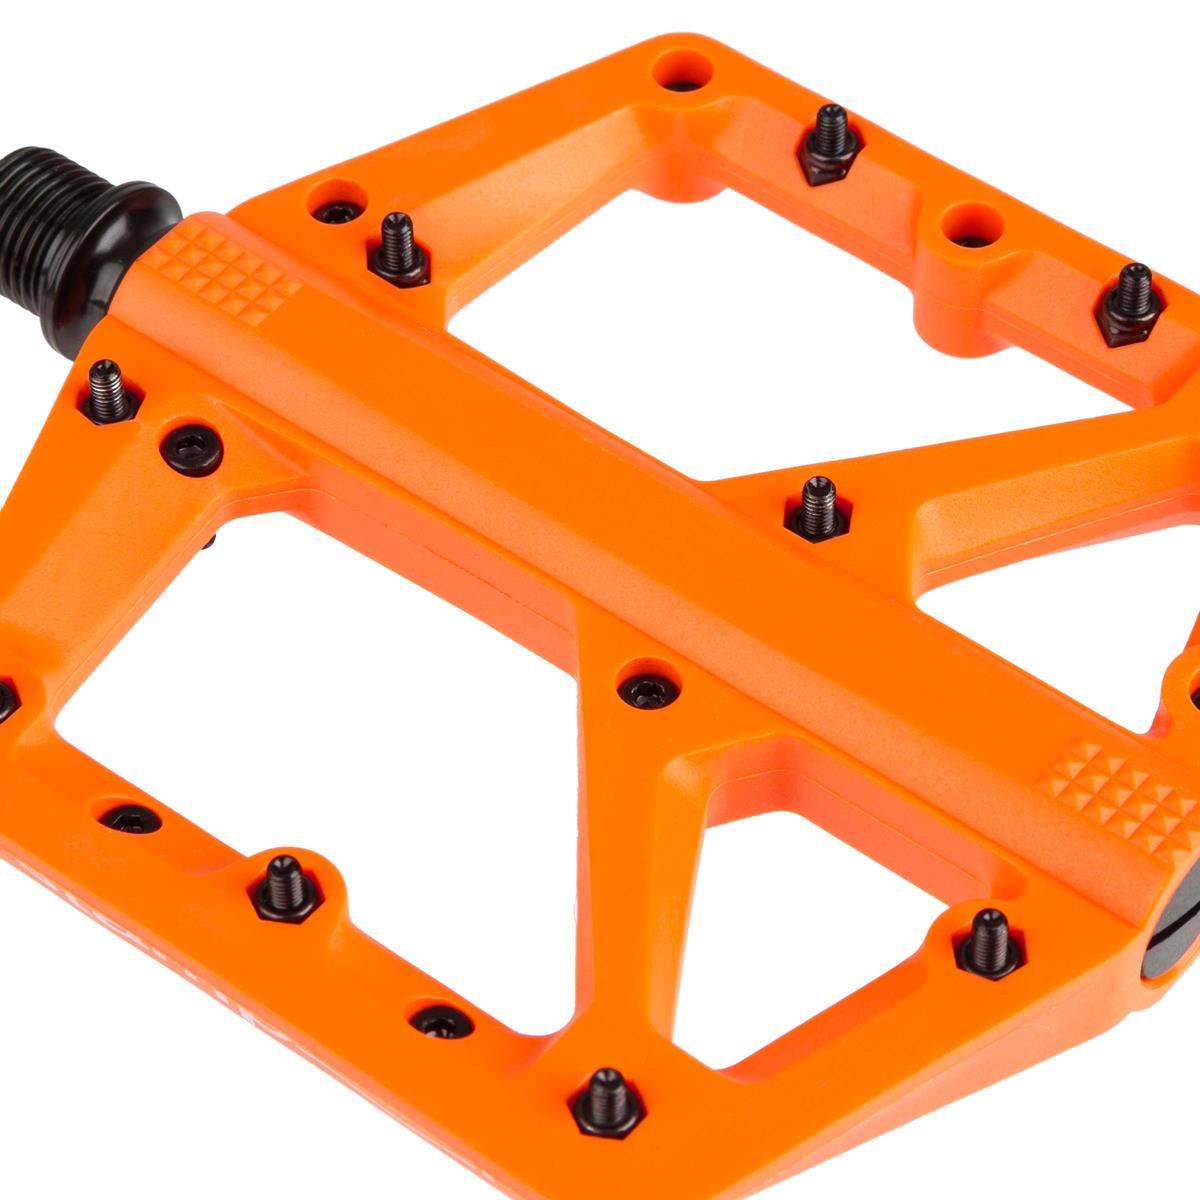 Orange Crank Brothers Stamp 1 Small Platform Pedals